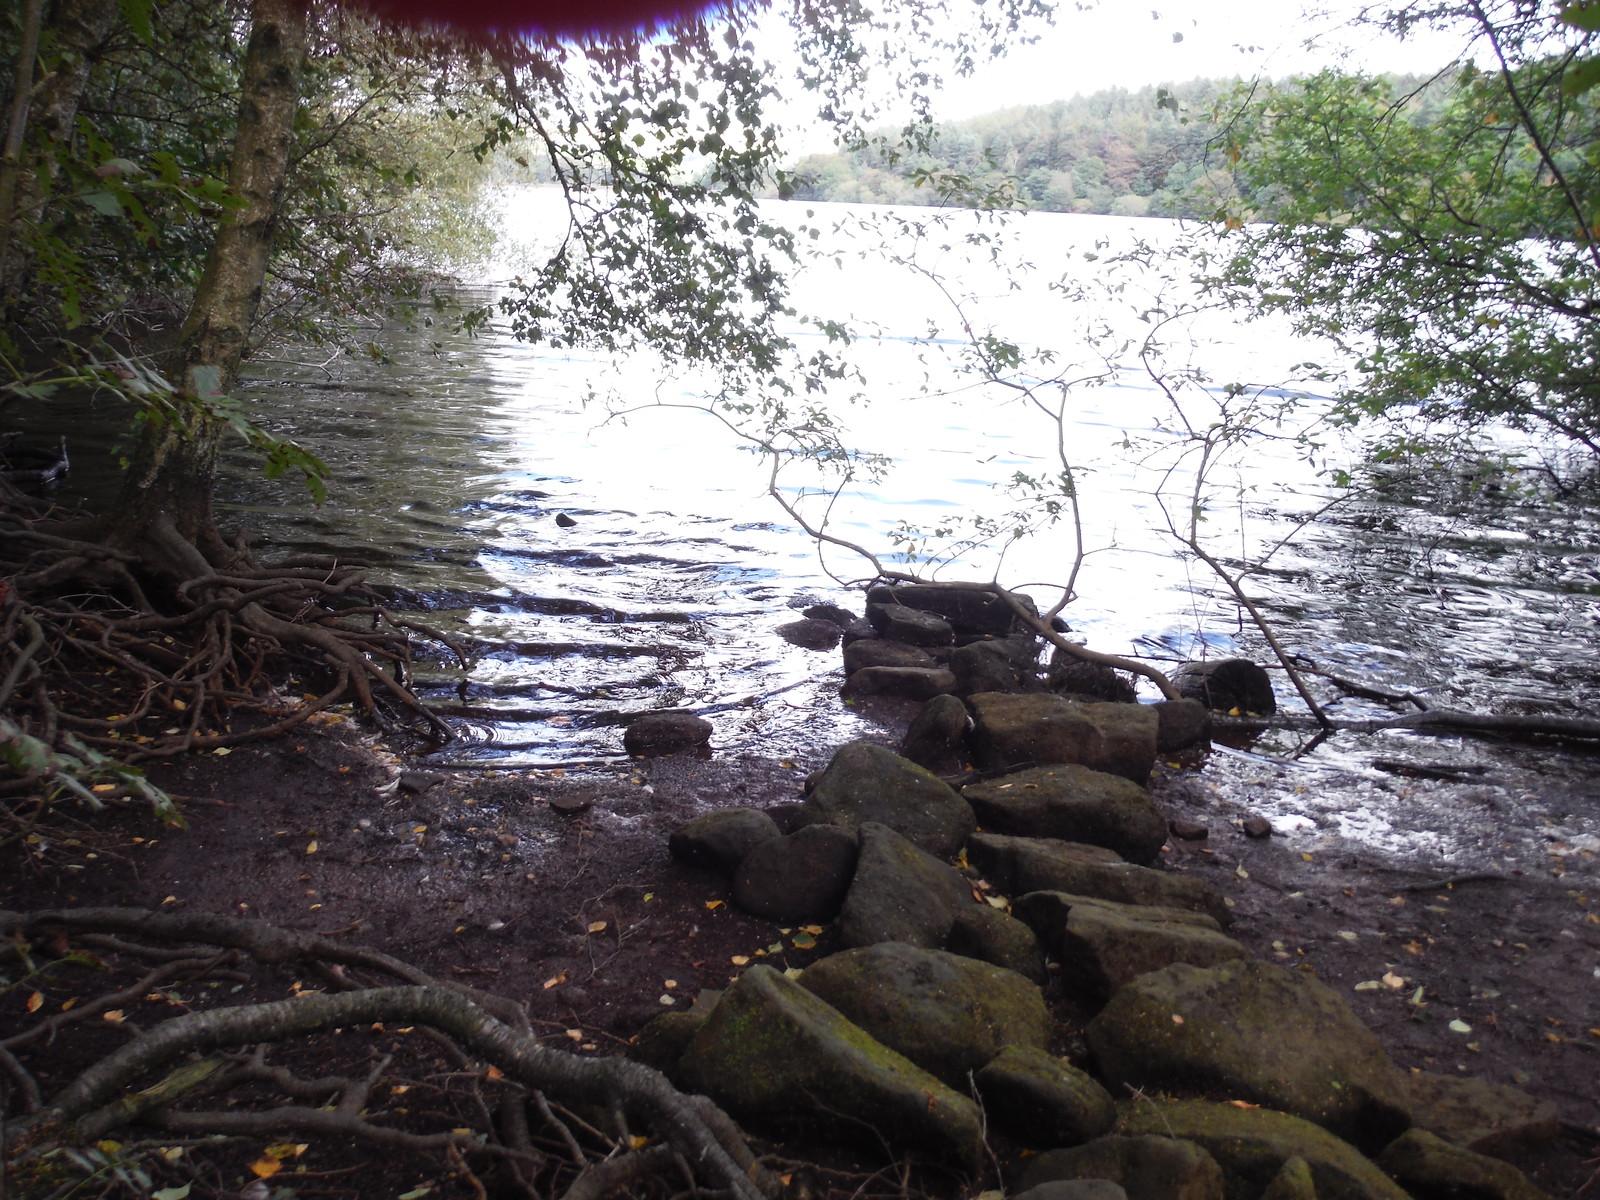 Dale Dike (Reservoir) SWC Walk 348 - Ladybower Inn Circular (via Derwent Edges and Strines)